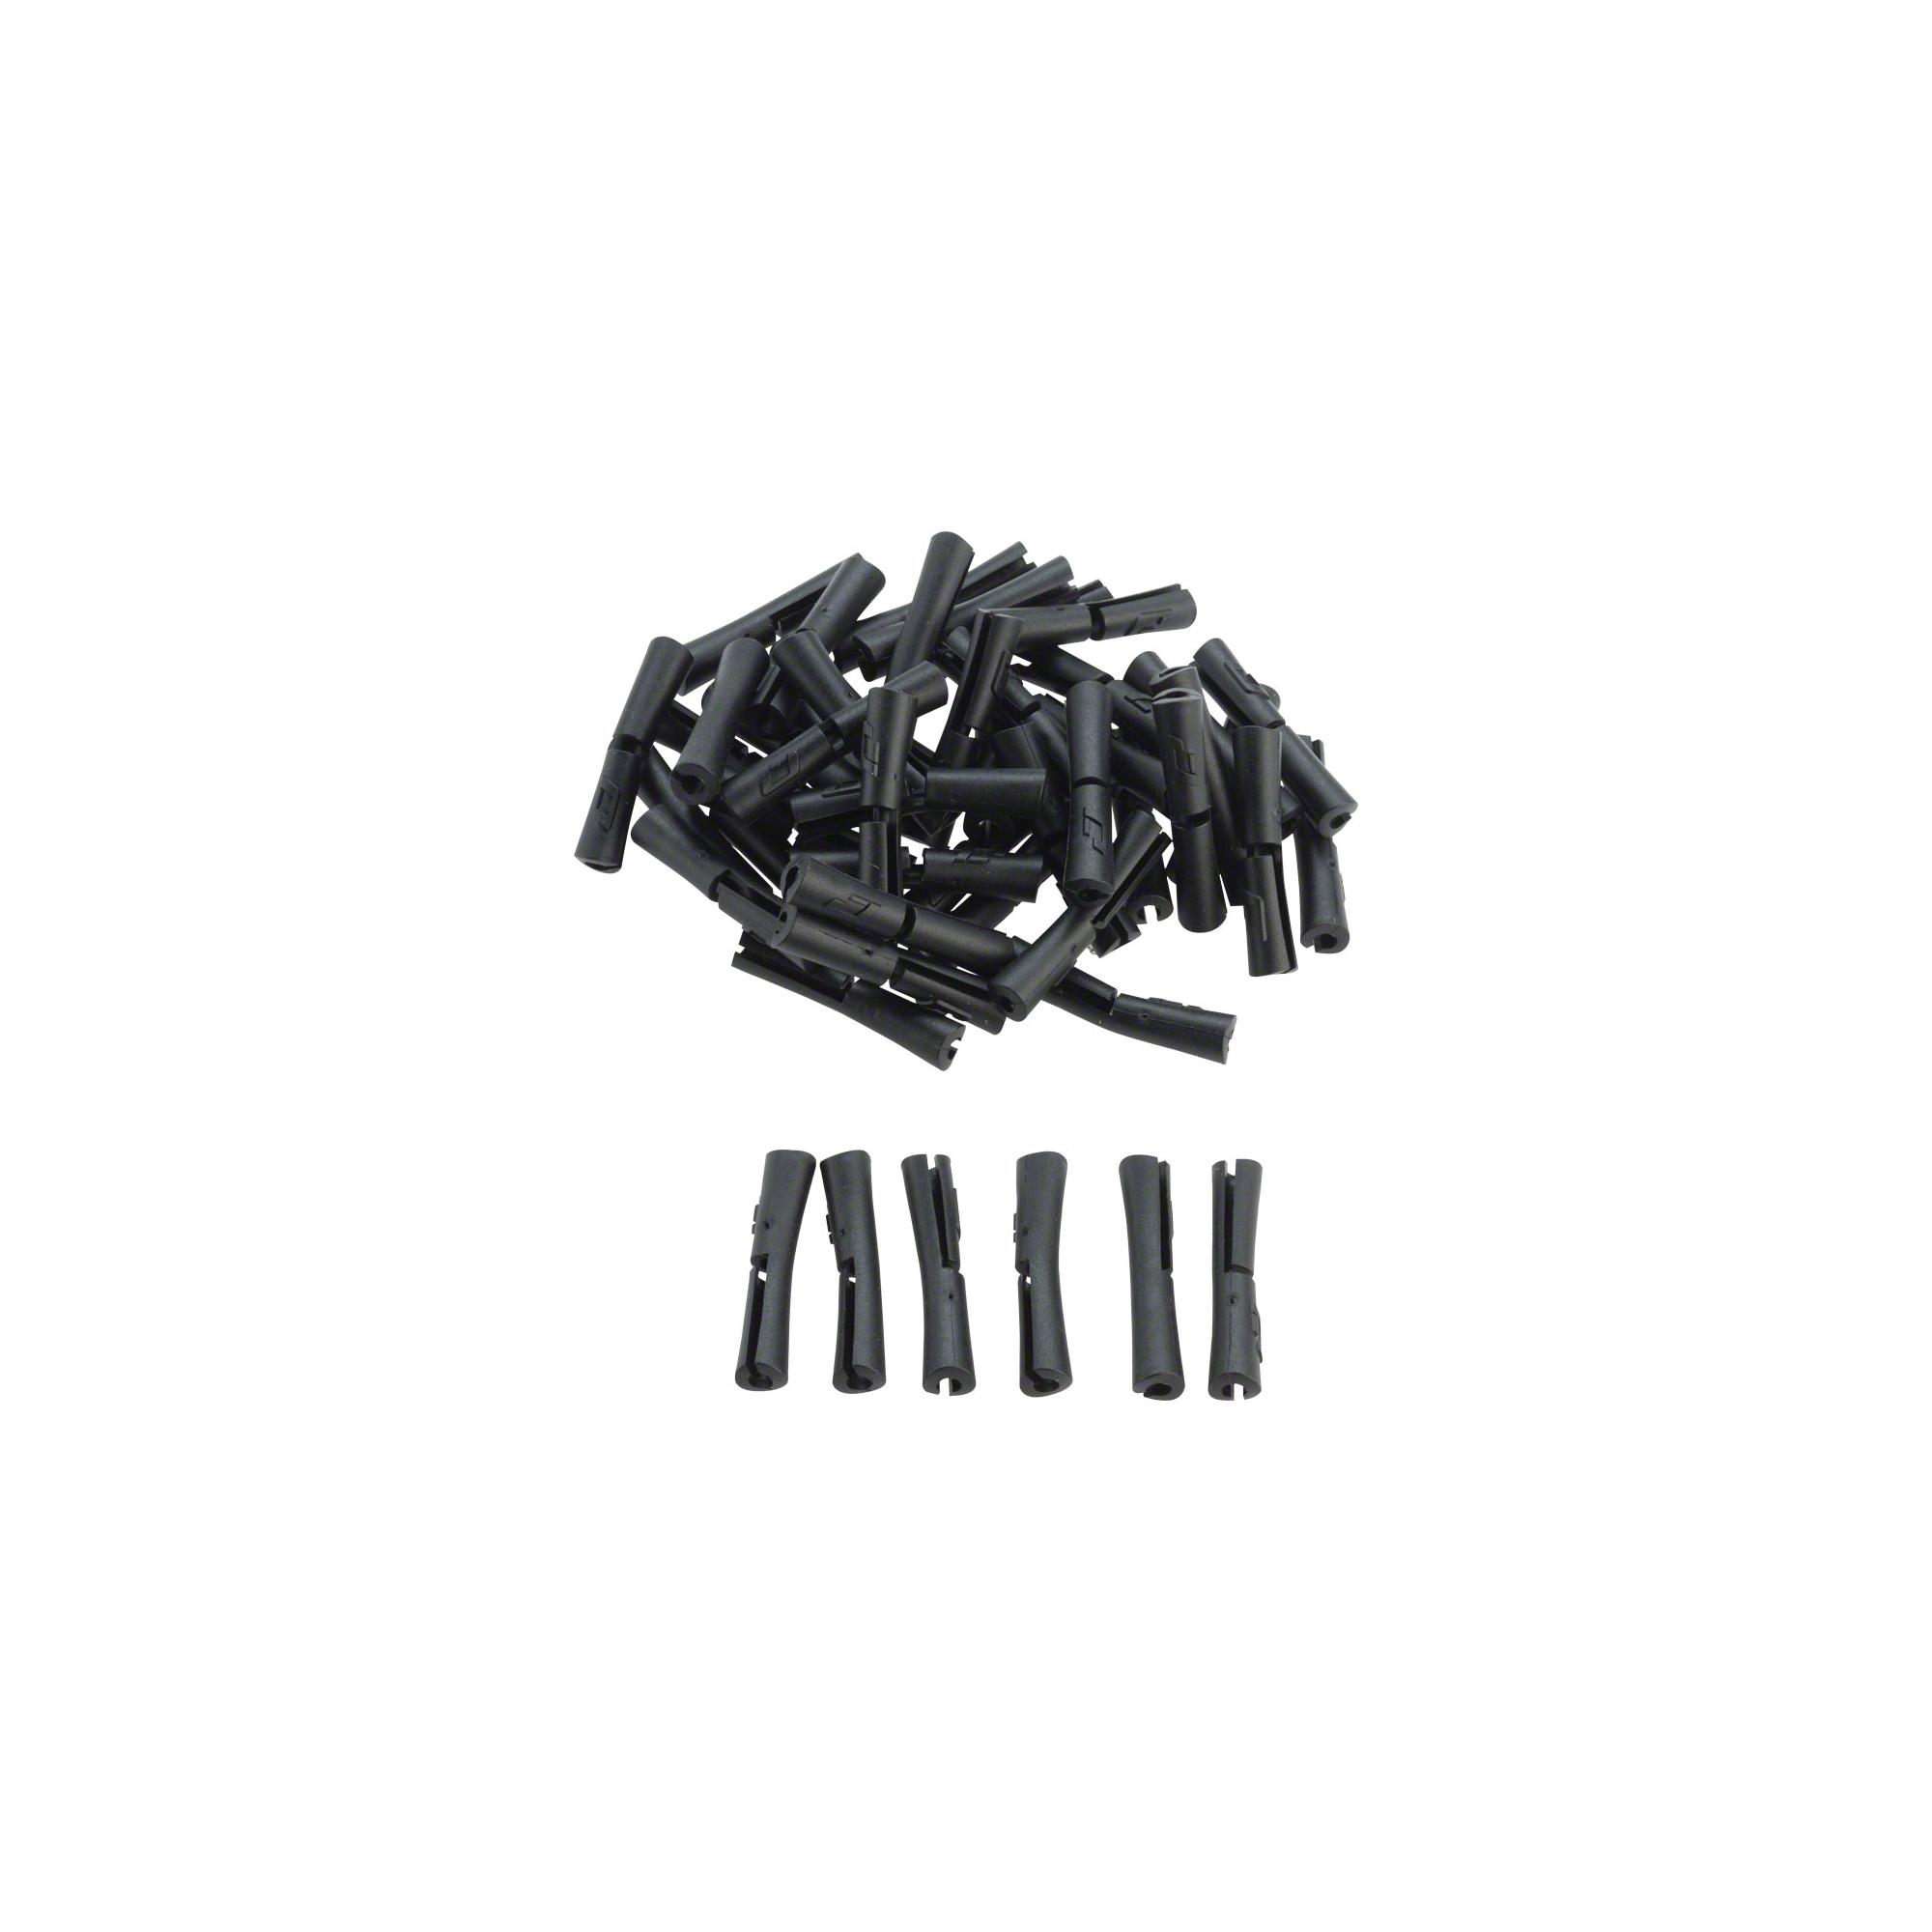 Black Bag//4 Jagwire Tube Tops 5G Frame Protectors for Brake or Shift Housing